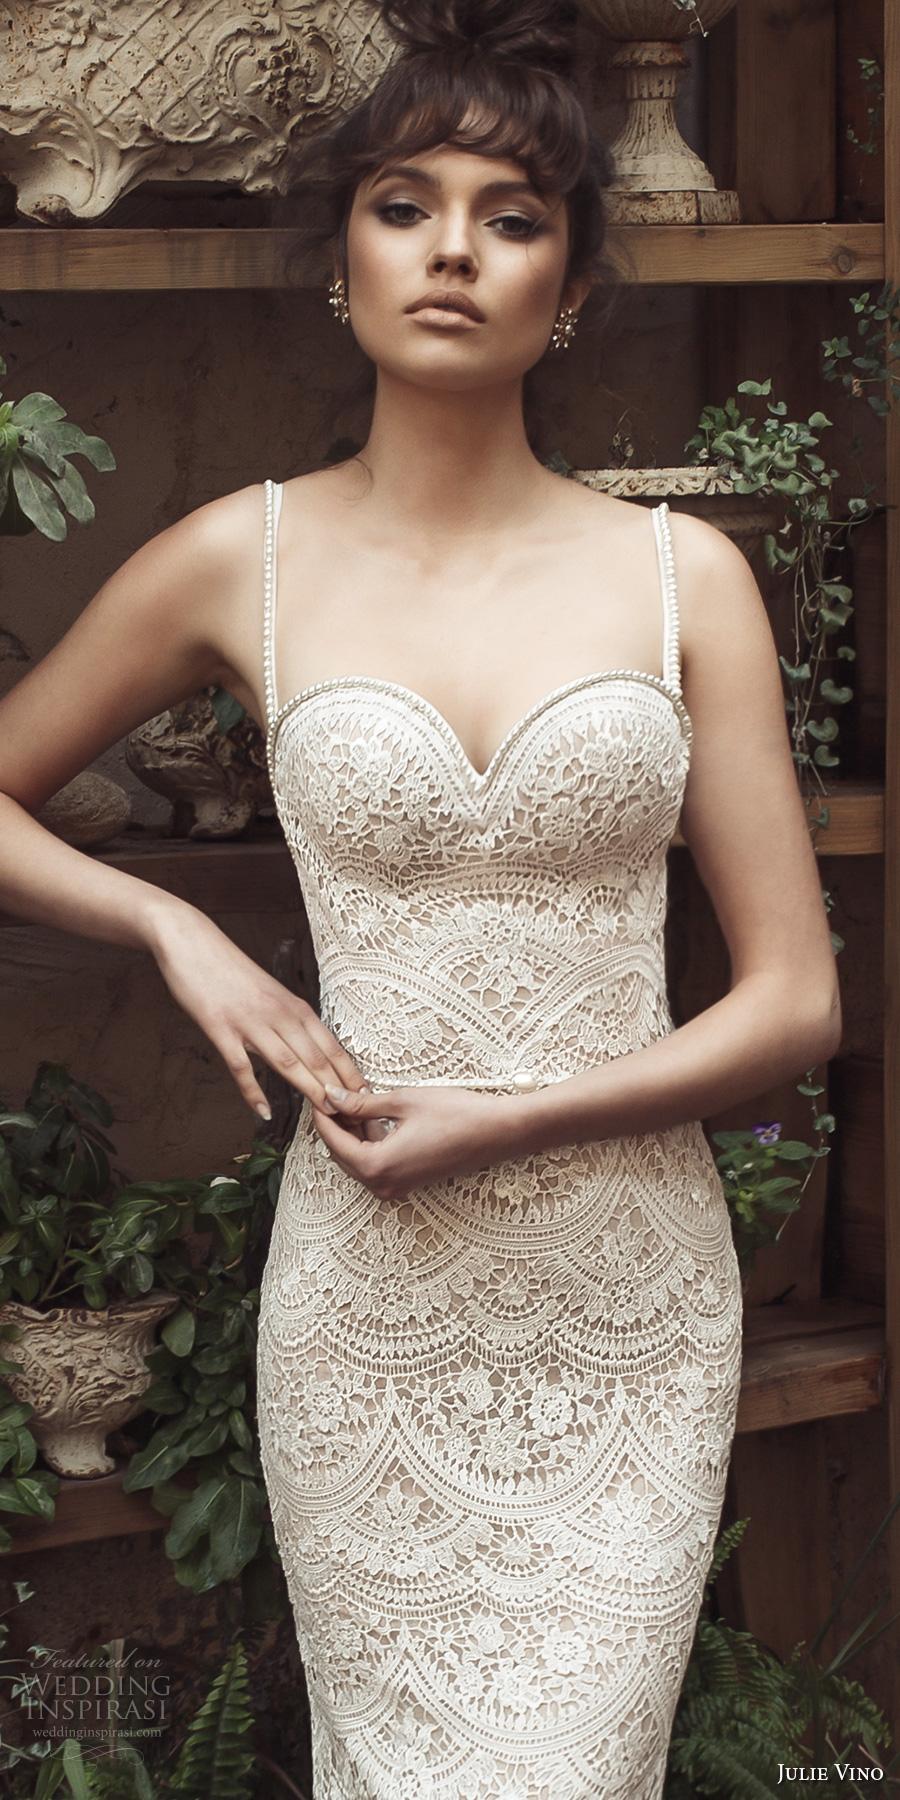 julie vino 2017 bridal spagetti strap sweetheart neckline full embellishment elegant romantic sheath wedding dress open low back short train (1254) zv